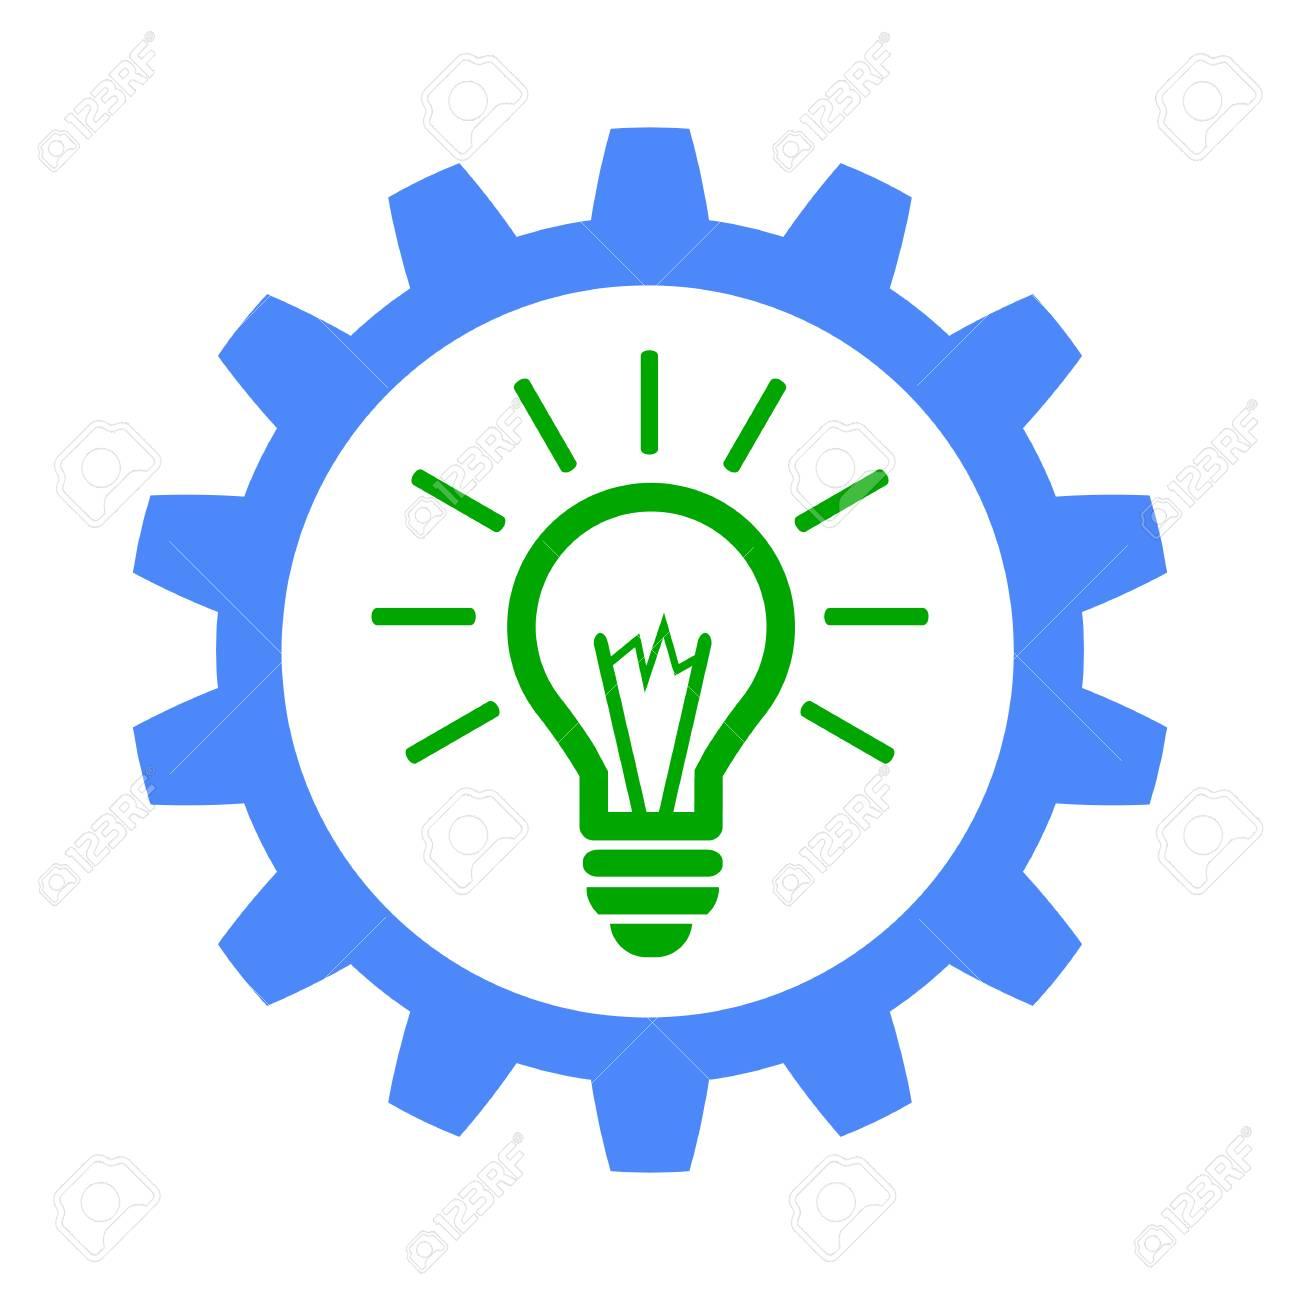 Gear Generator Idea Icon Royalty Free Cliparts Vectors And Stock